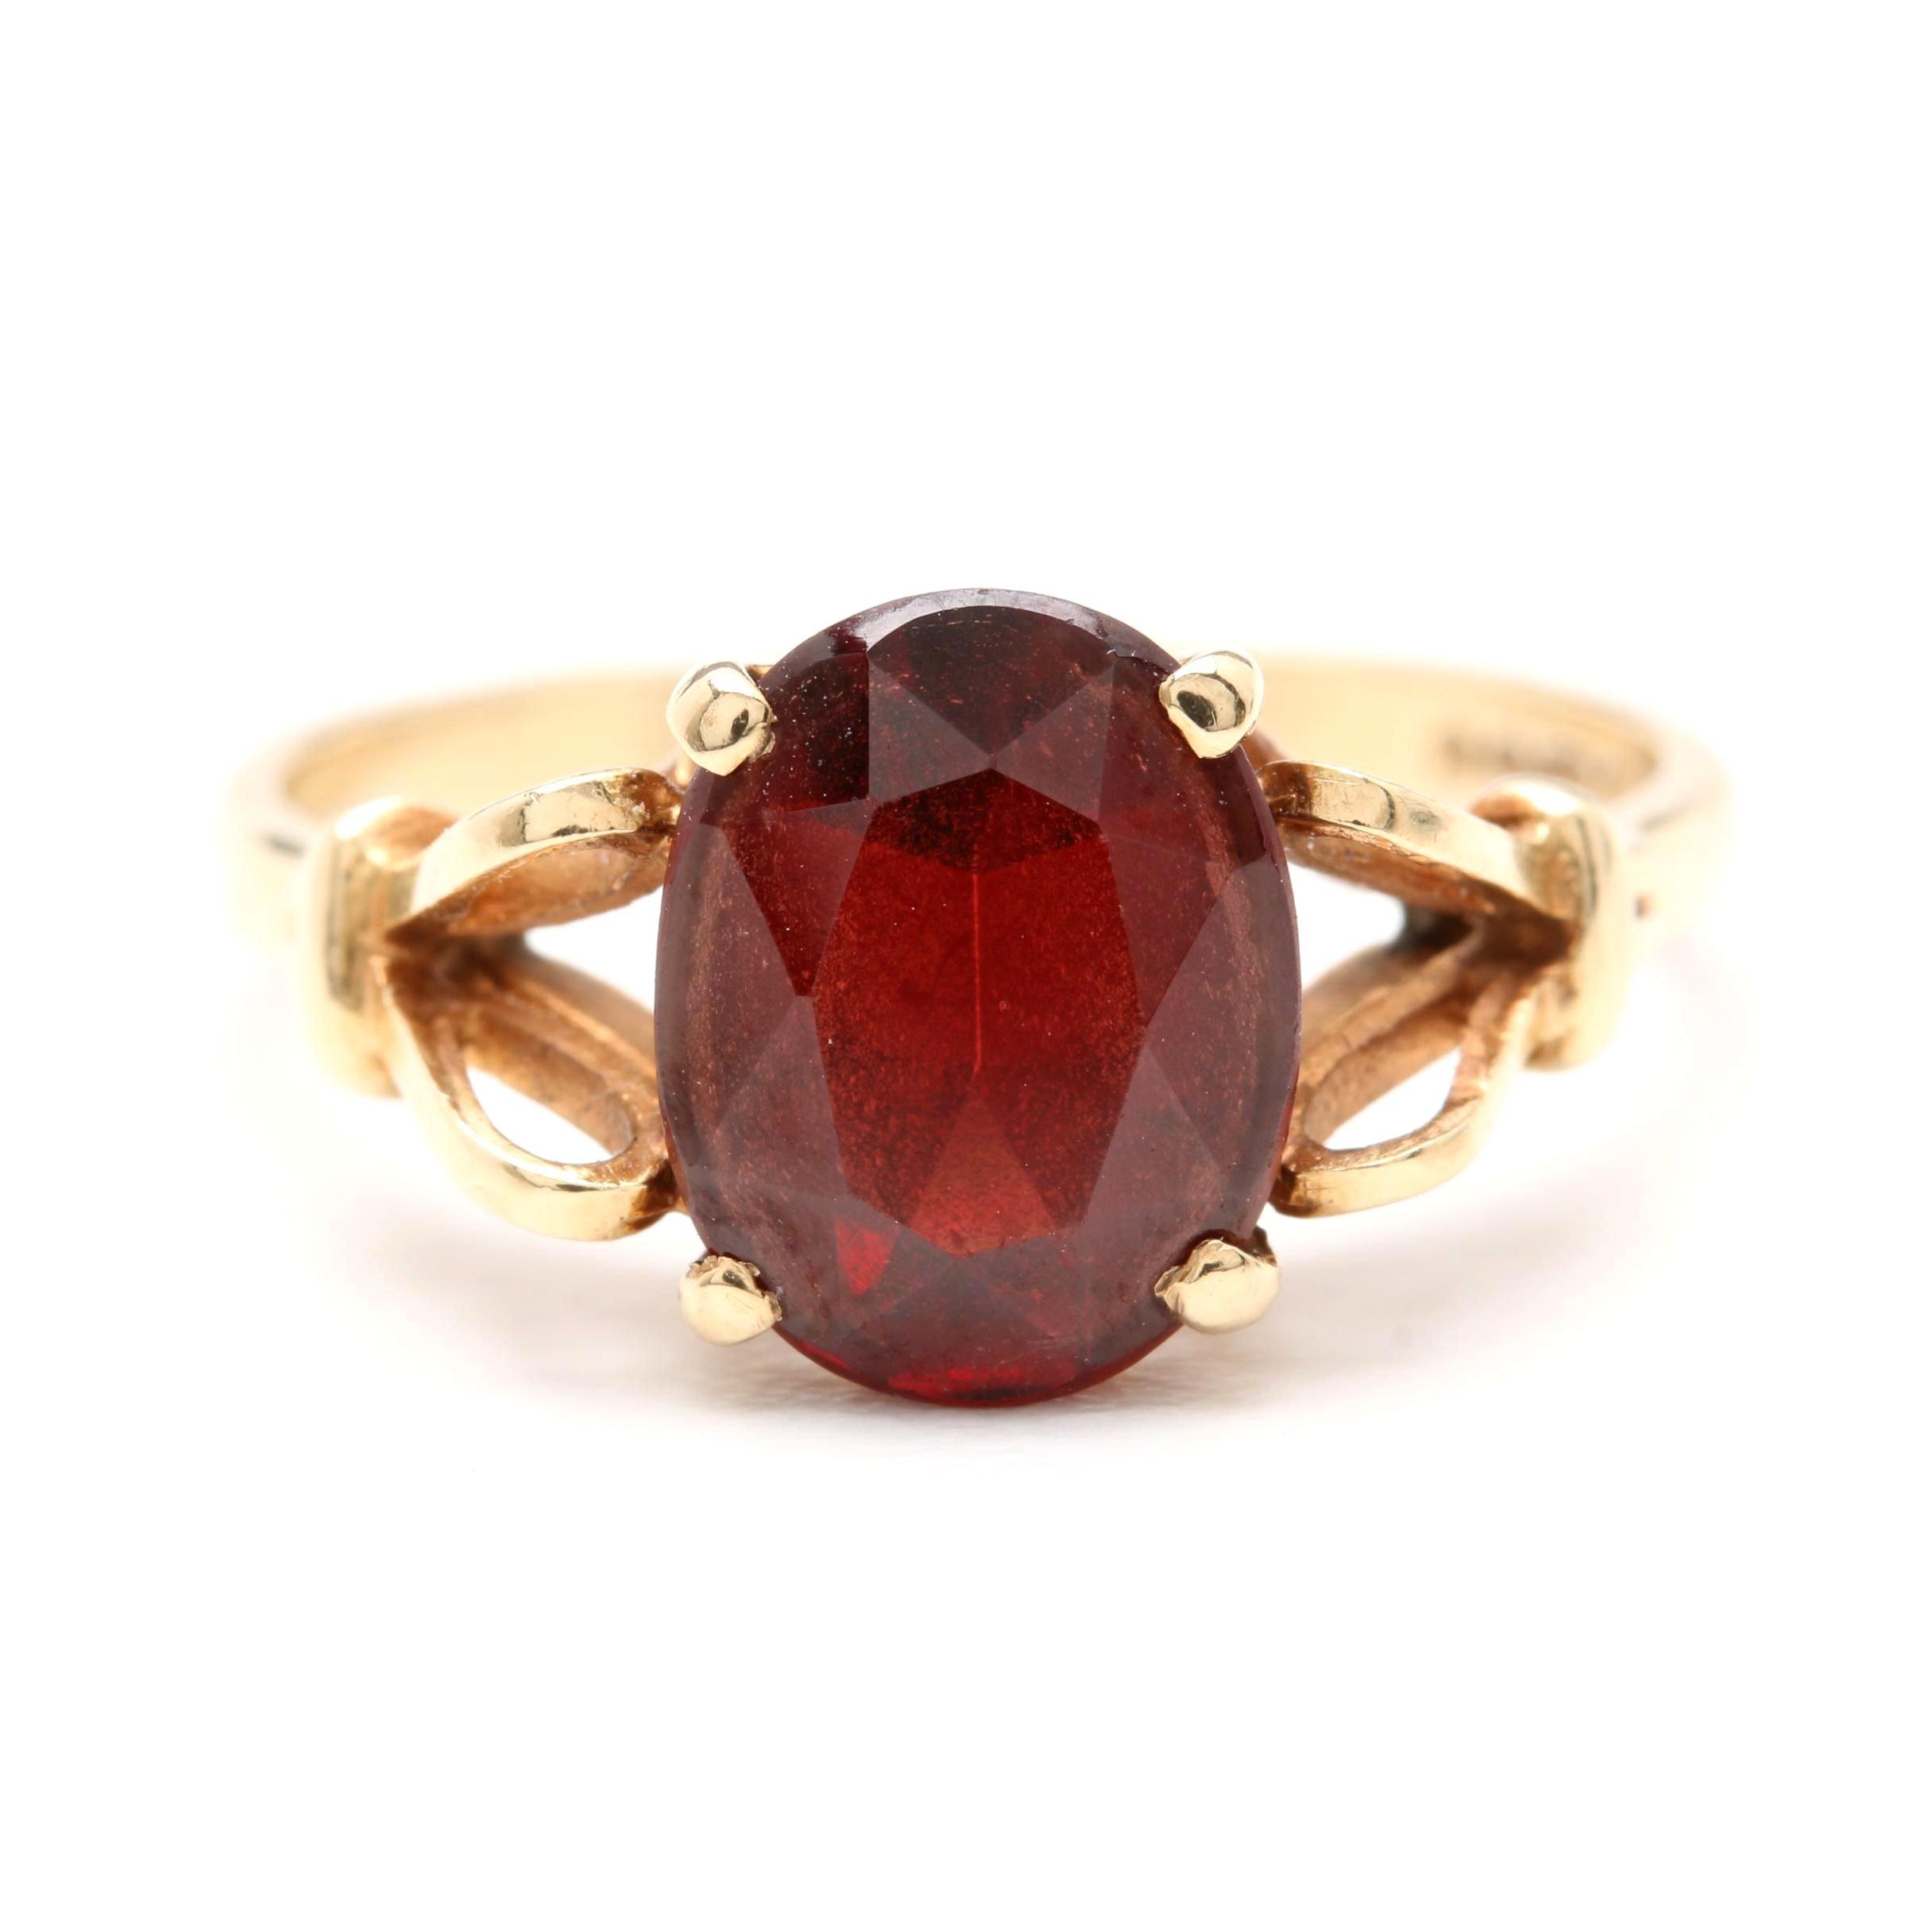 Vintage 1940s - 1950s 9K Yellow Gold Garnet Ring